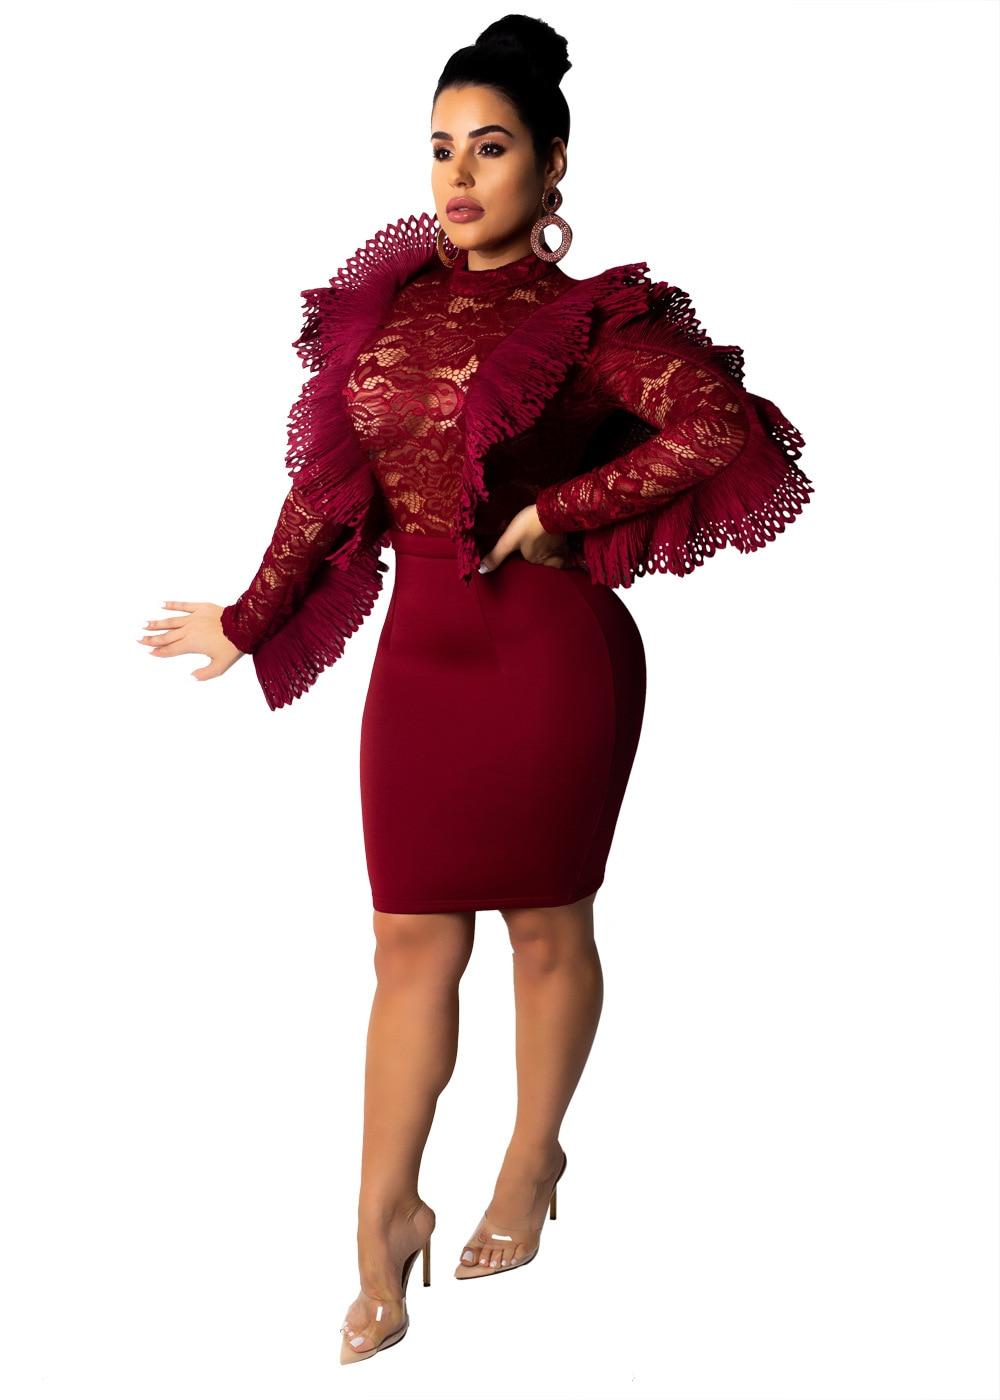 e418889a2a Women Lace Sheer Mesh Bodycon Sexy Dress Female Club Outfit Ruffle Sleeve  Mini Vintage Woman Dress Party Elegant Vestidos 2018